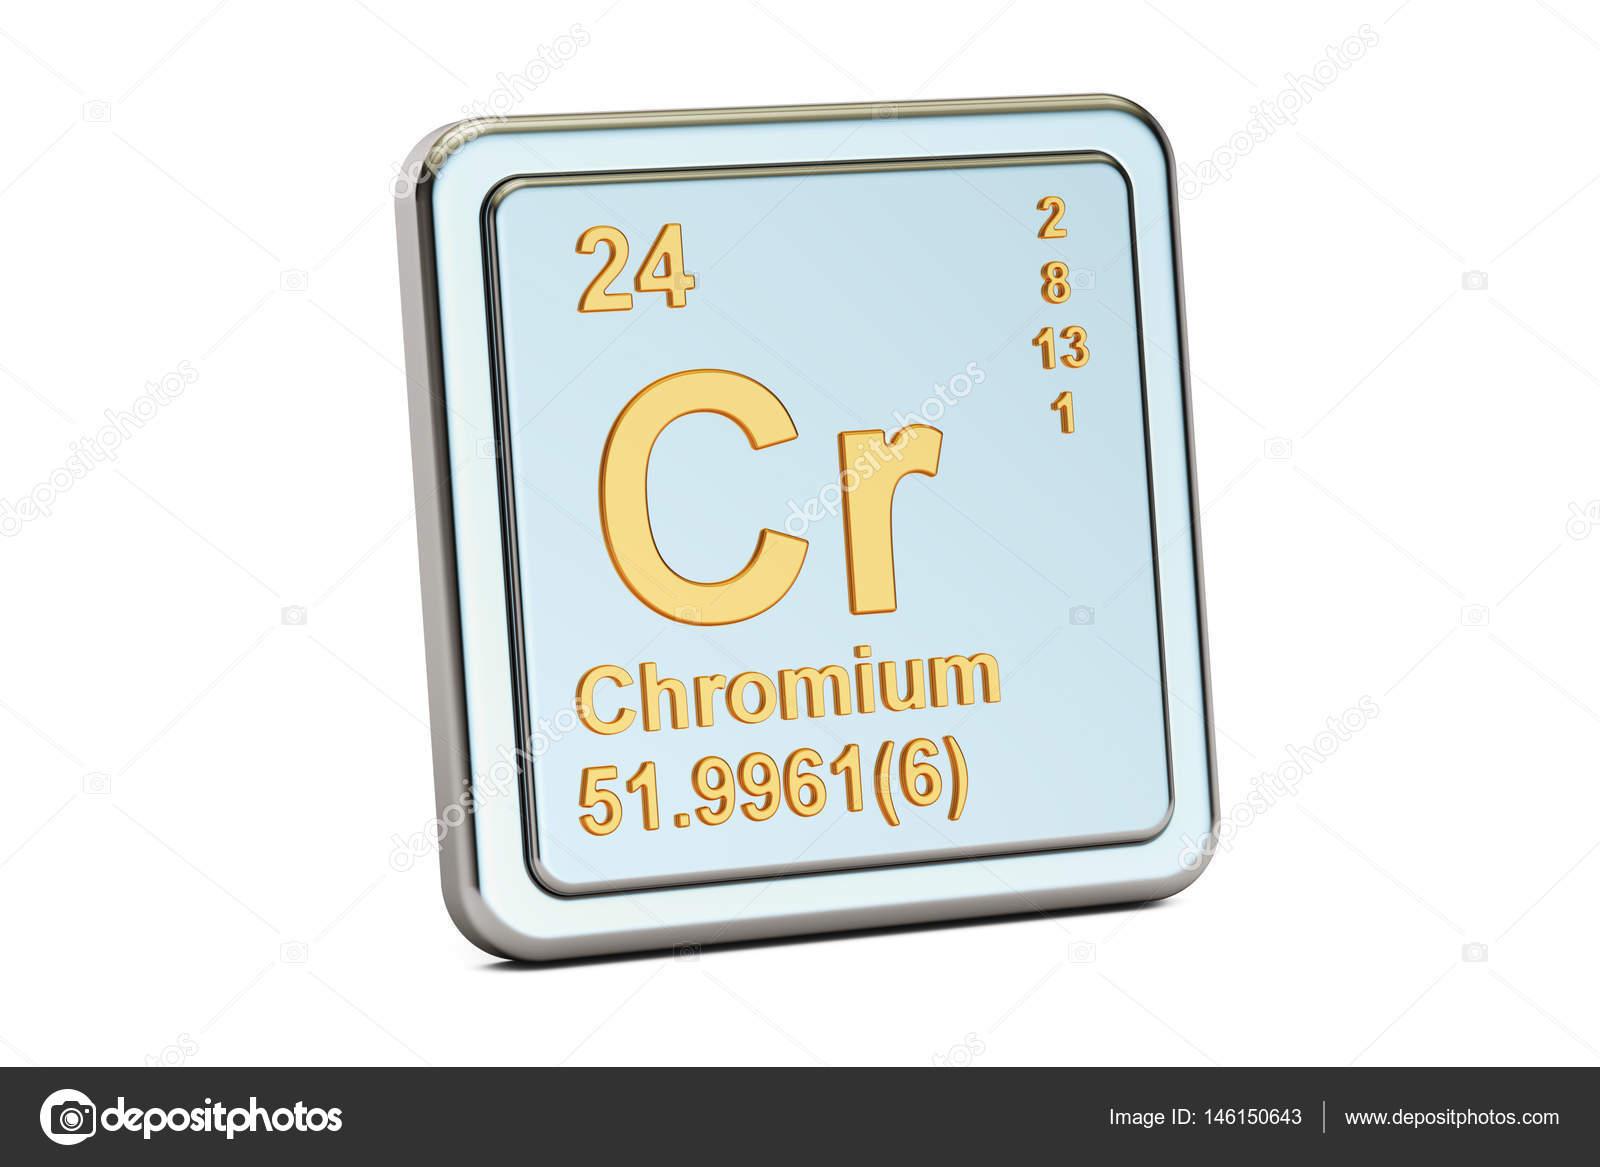 Chromium Cr Chemical Element Sign 3d Rendering Stock Photo